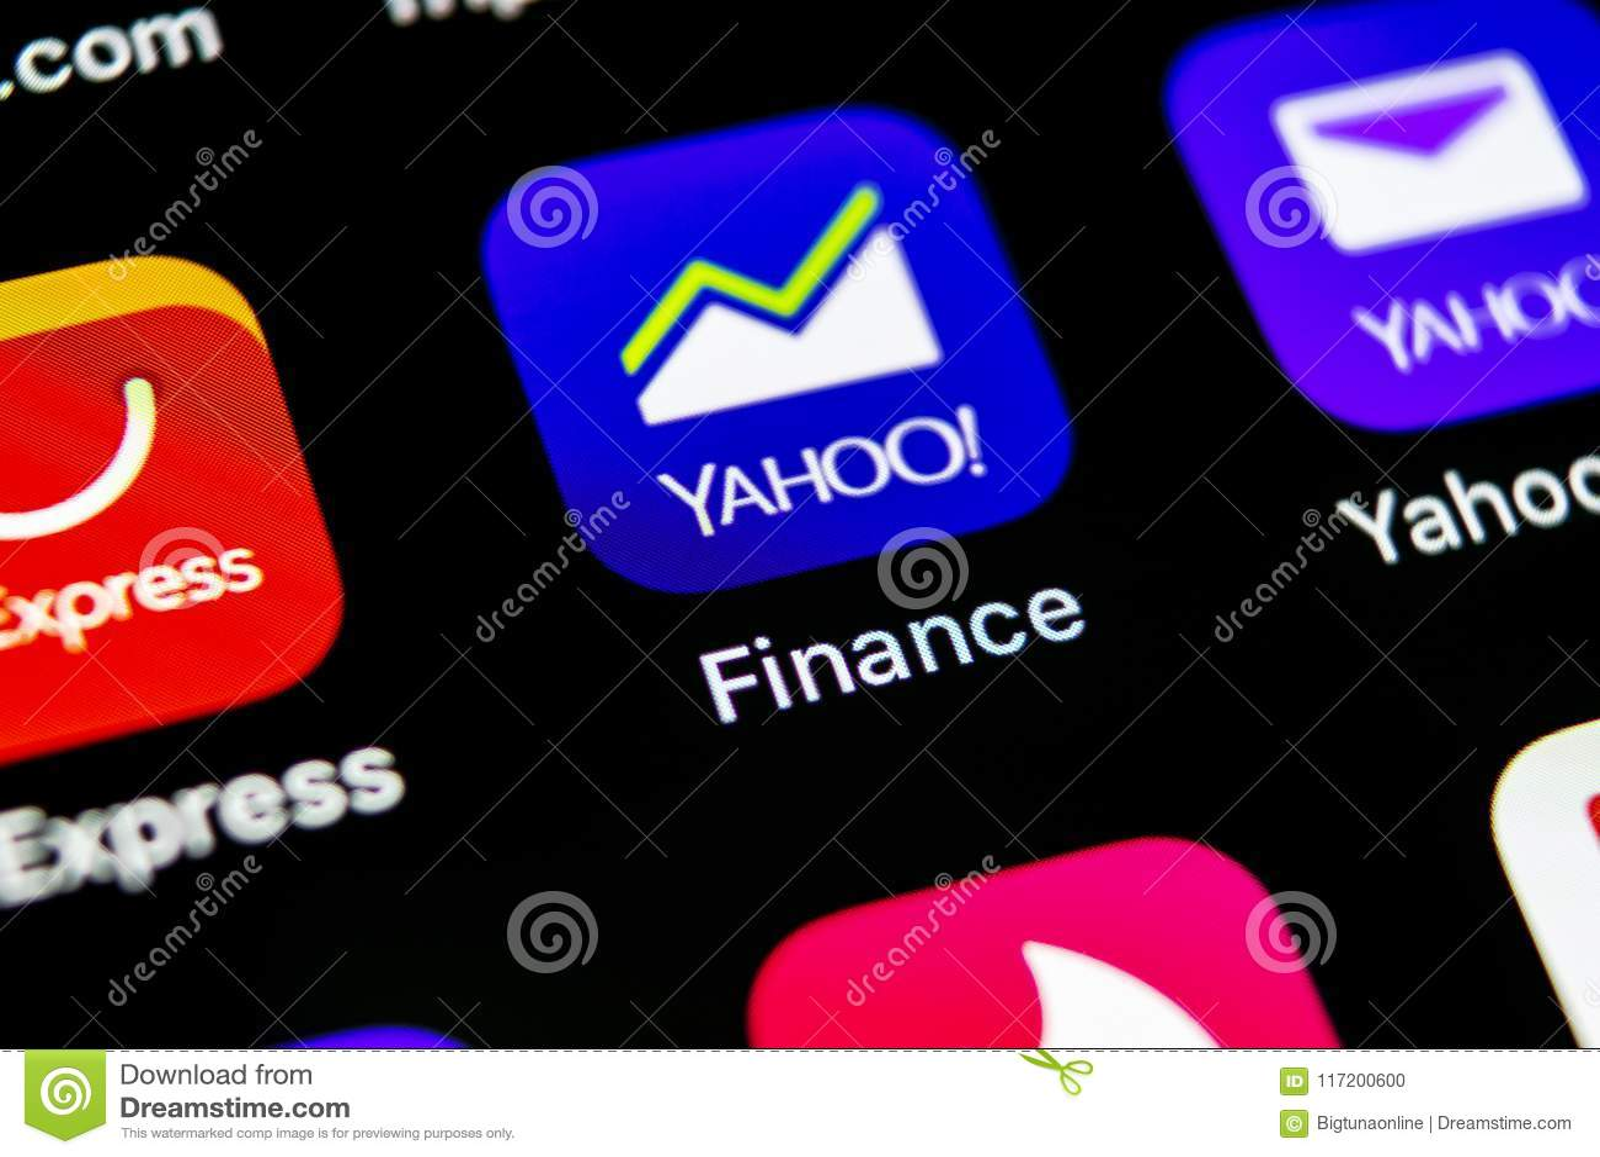 Yahoo Finance Application Icon On Apple Iphone X Smartphone Screen